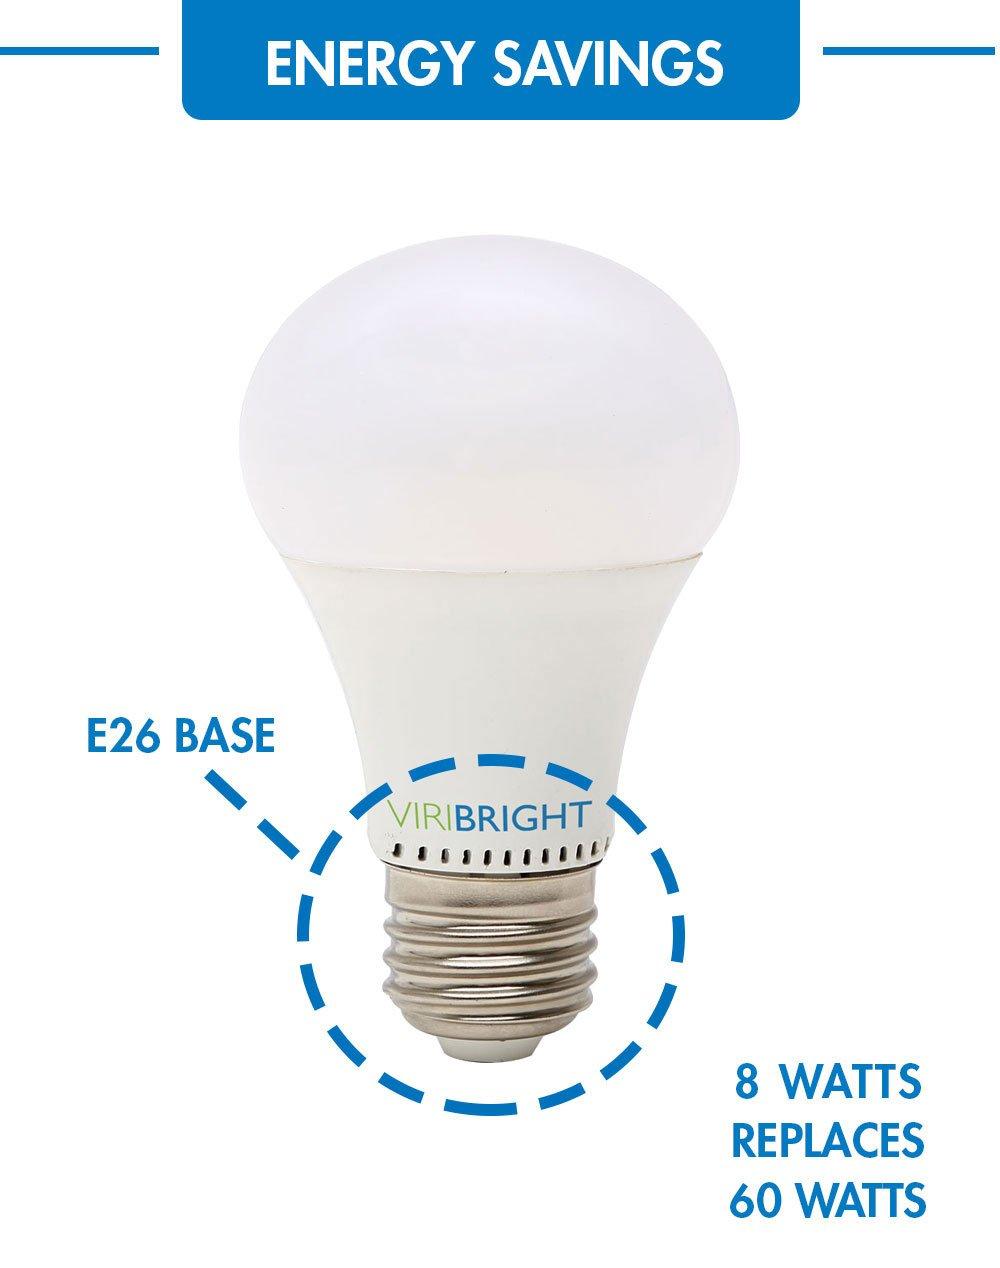 LED light Bulb Viribright 60 Watt Replacement A19 Cool White E26 Edison Base 6 pack Dimmable